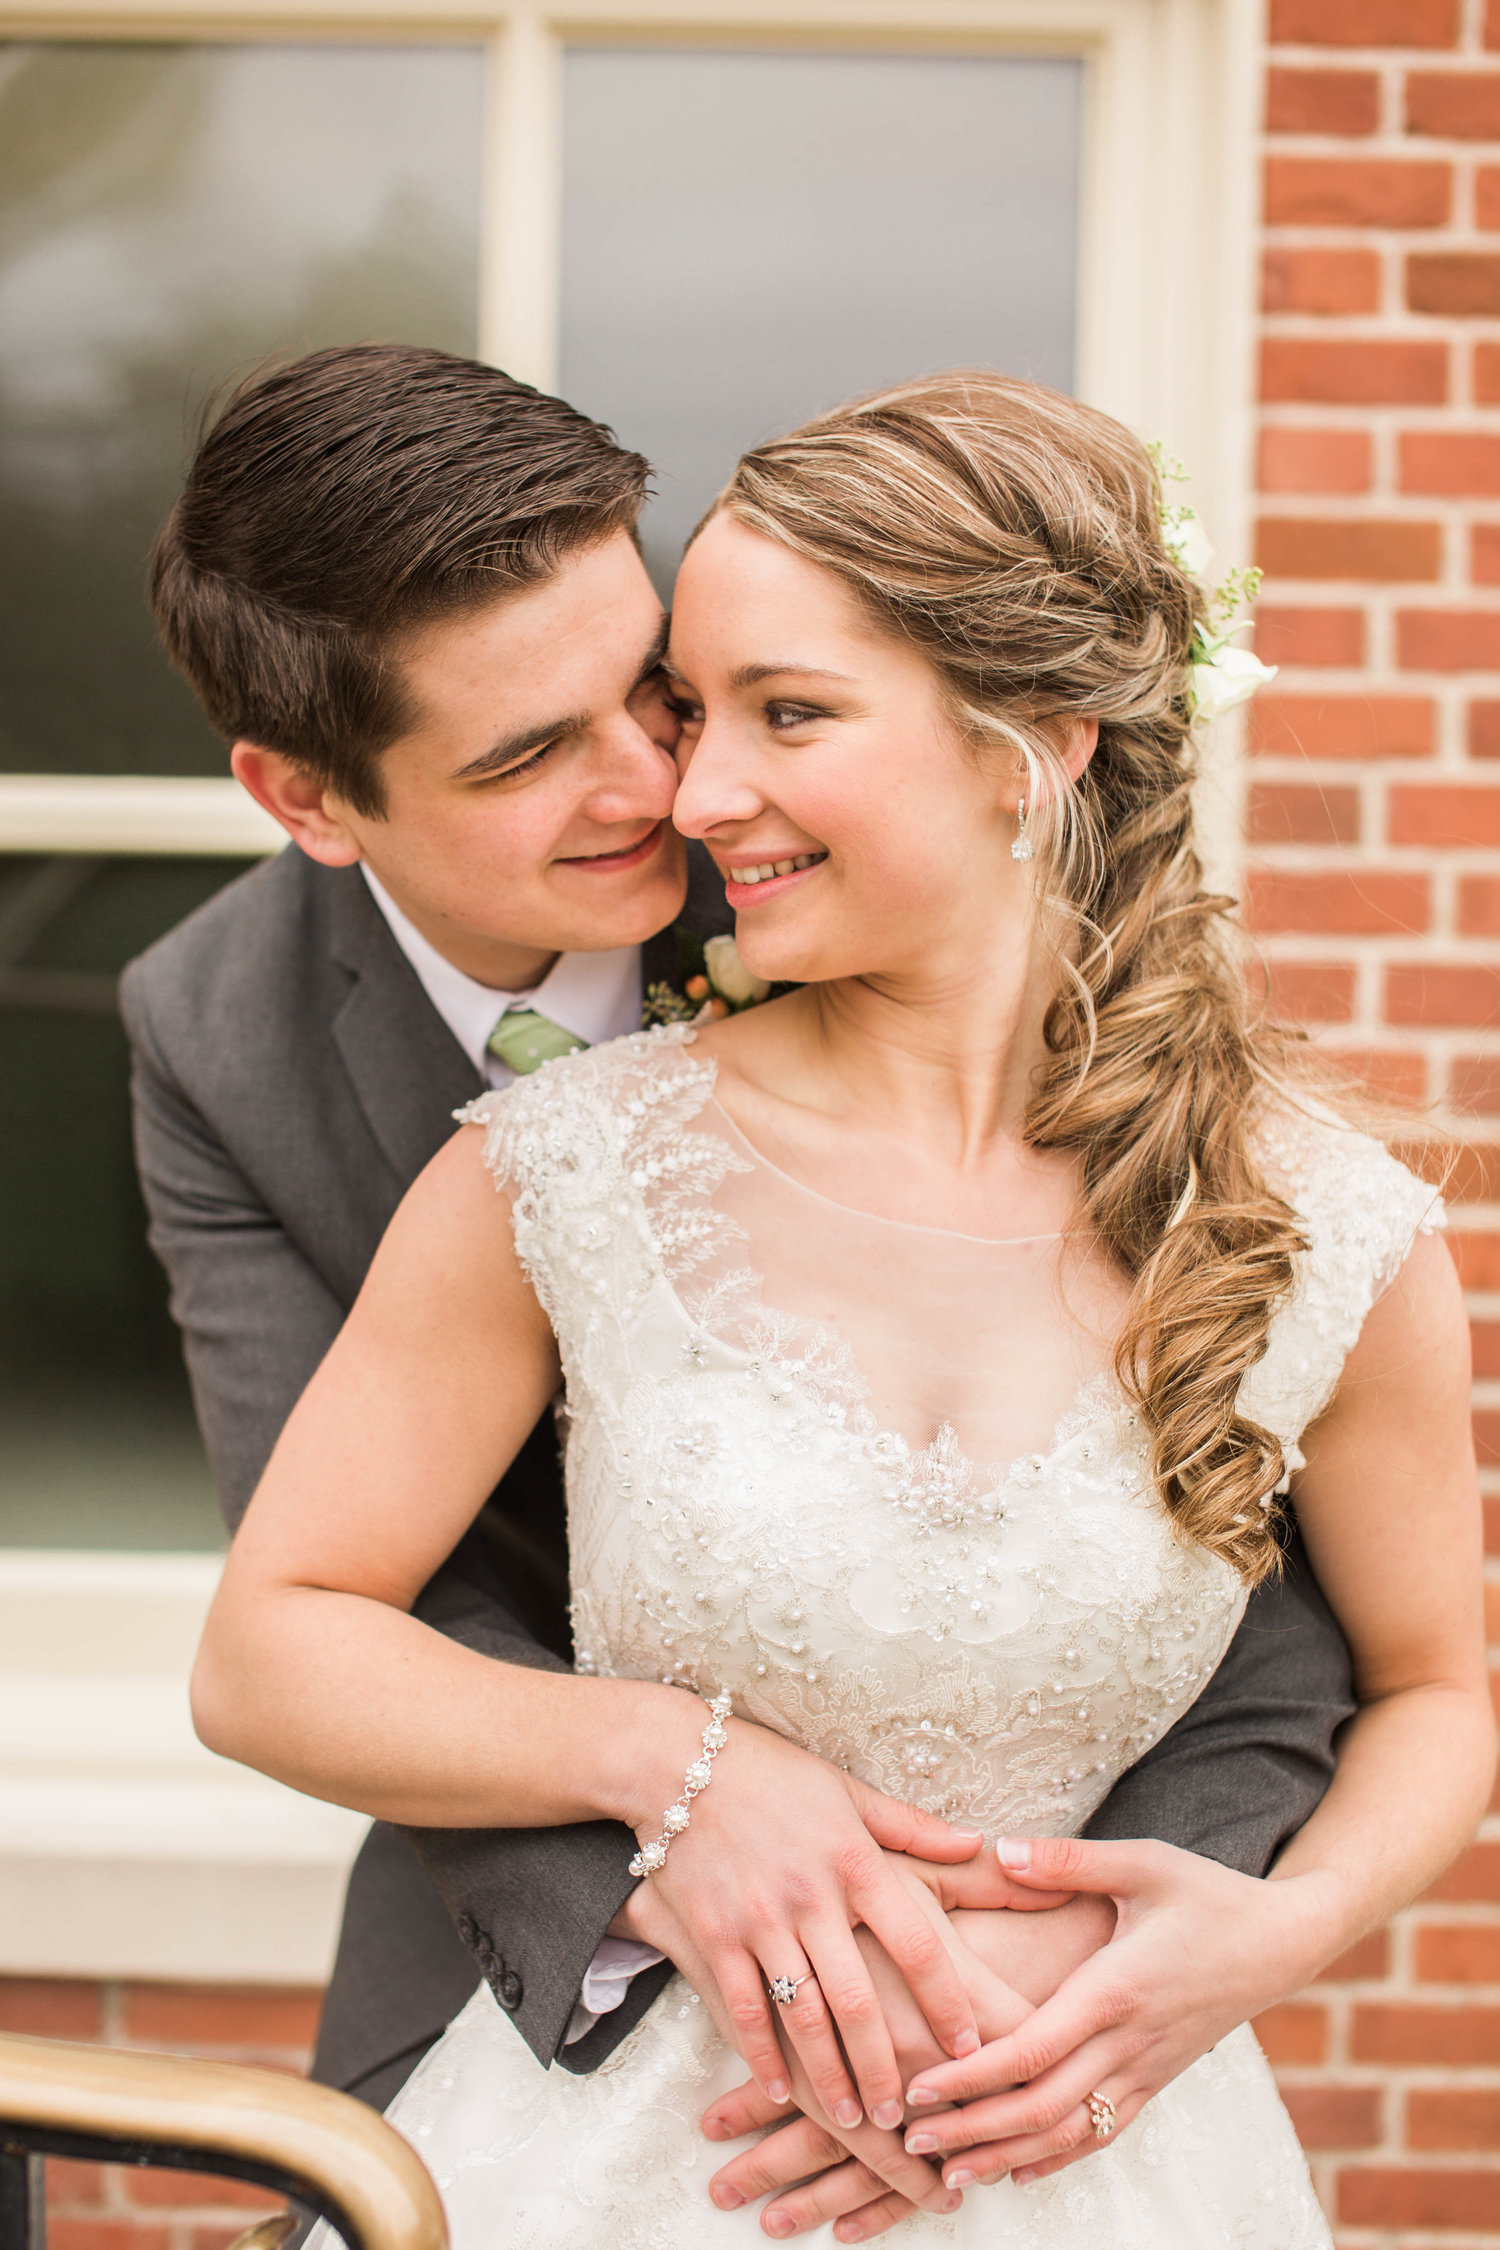 Robert + Holly - Van Wert, Ohio Wedding Photographer